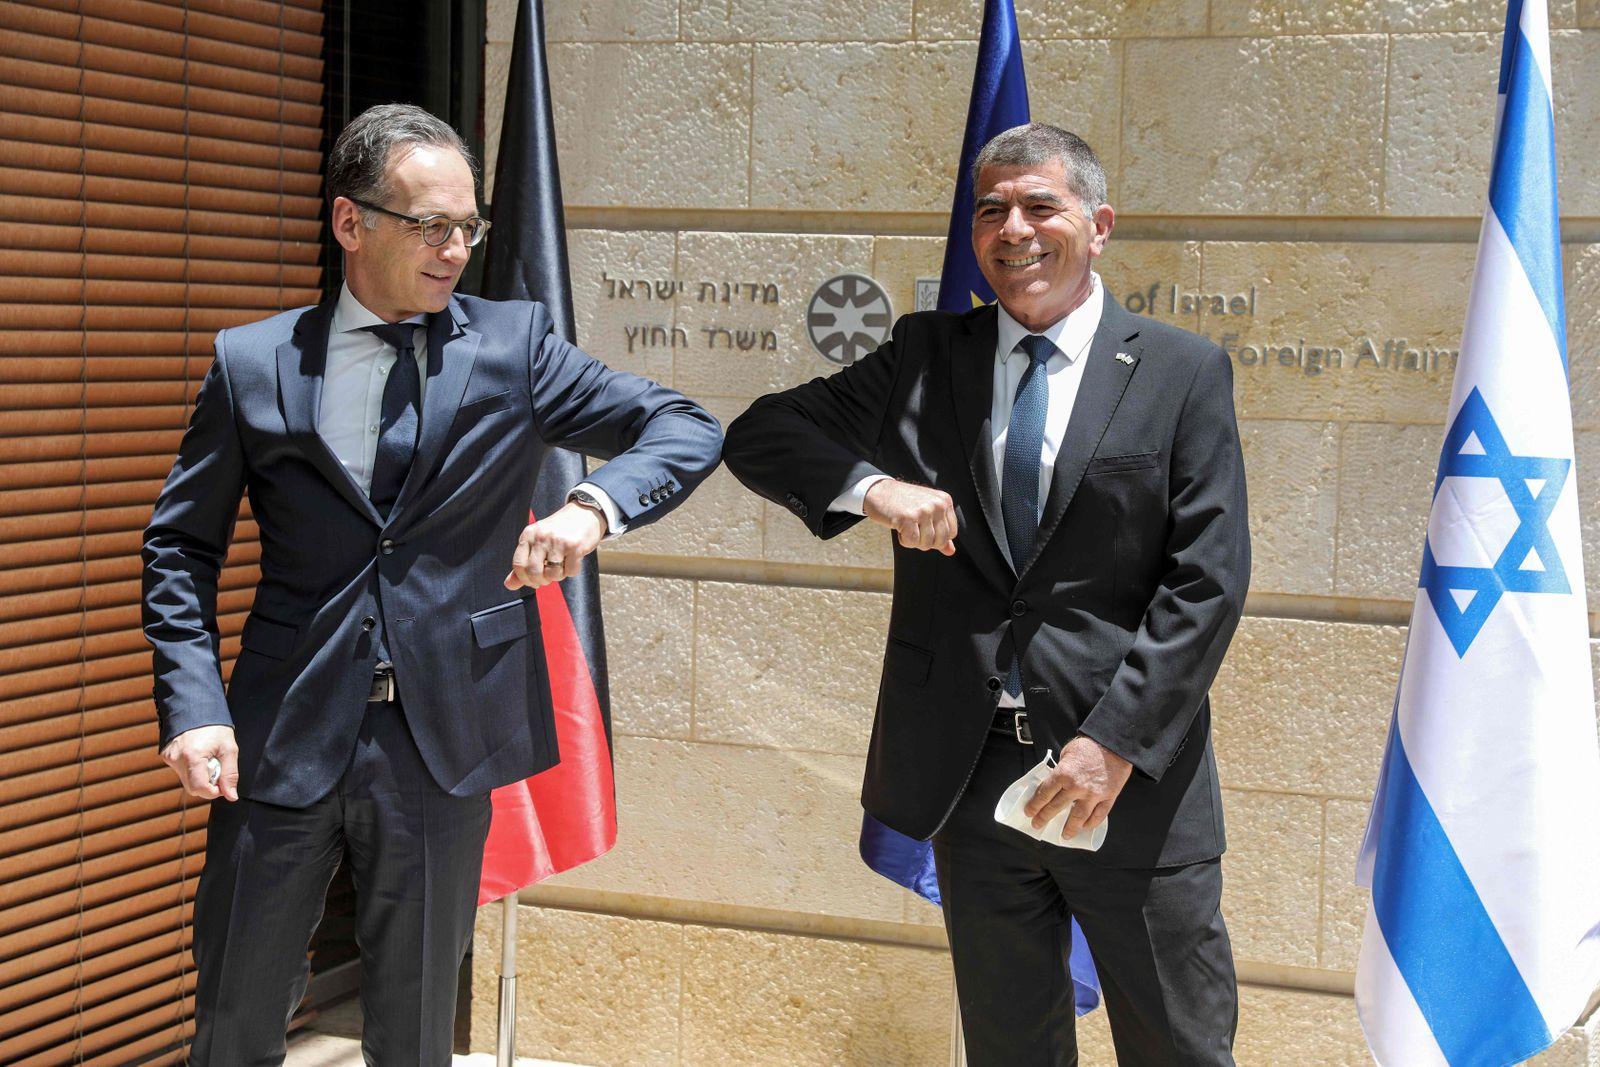 ISRAEL-GERMANY-POLITICS-DIPLOMACY